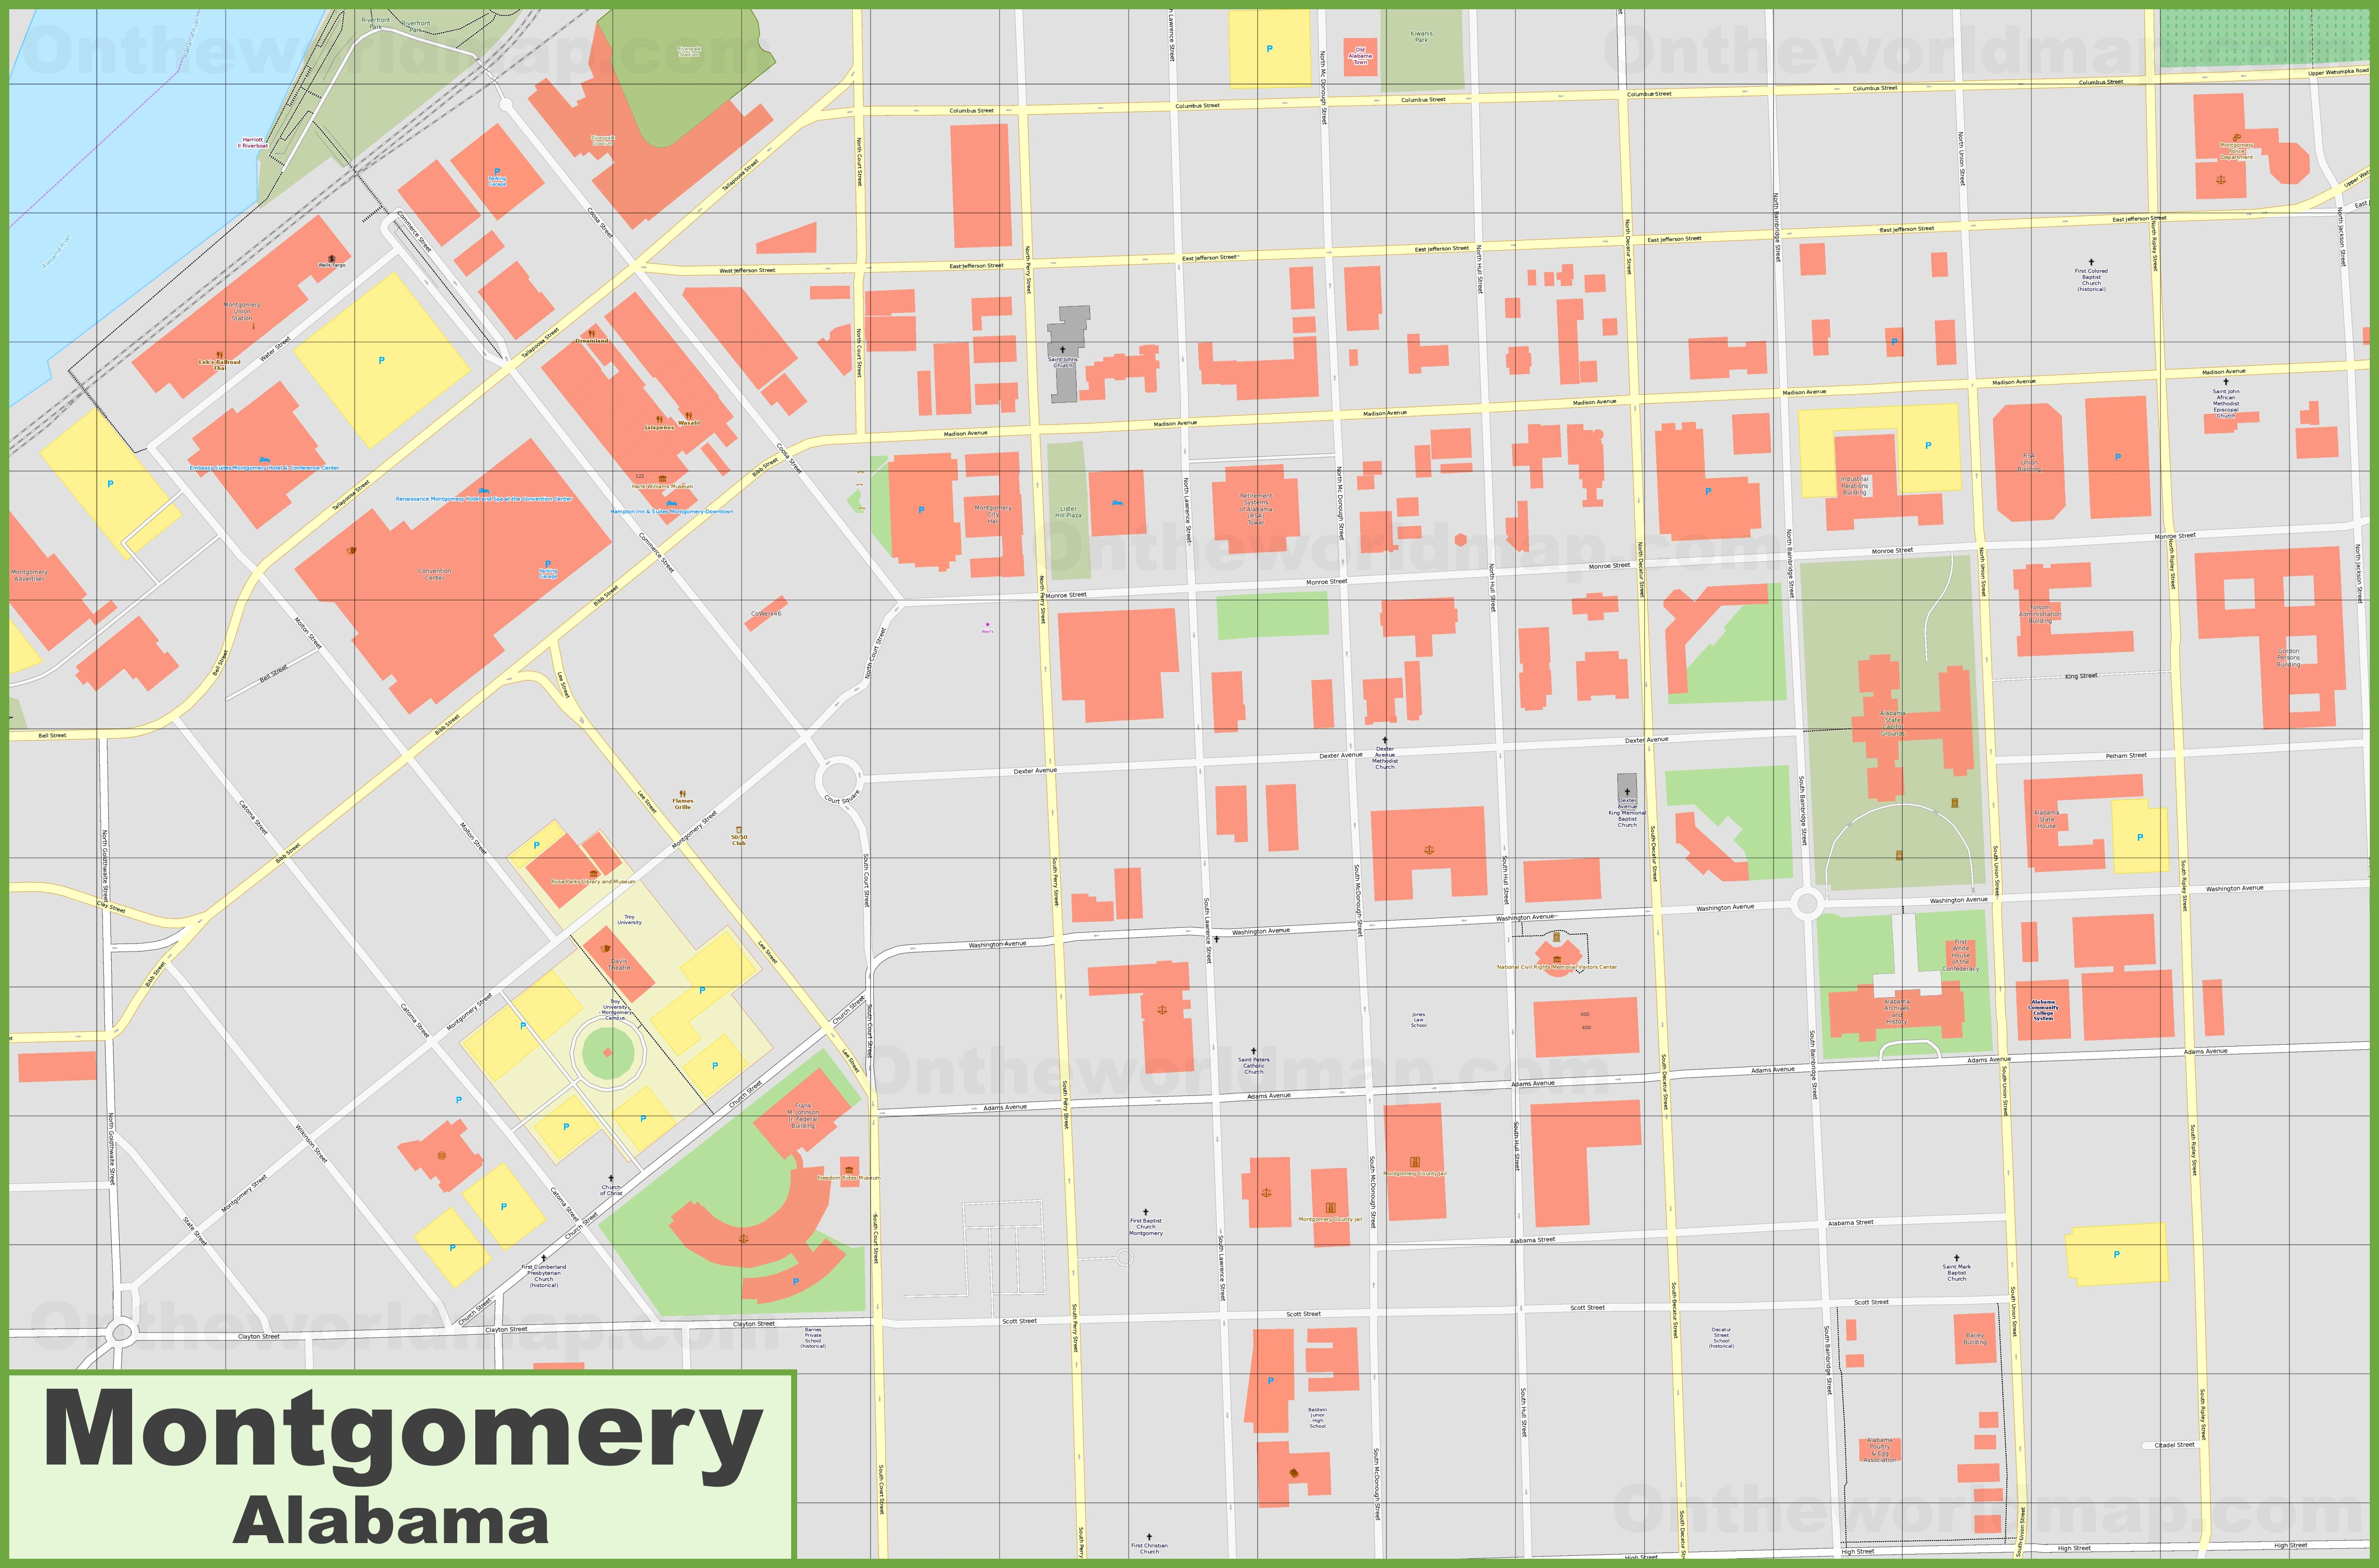 Montgomery downtown map on omaha ne map, roanoke va map, milwaukee wi map, montgomery alabama, san antonio tx map, marion co alabama on map, phoenix az map, san diego ca map, trenton nj map, nashville tn map, richmond va map, montgomery tx map, st louis mo map, newport ri map, montgomery state map, erie pa map, augusta ga map, rochester ny map, oklahoma city ok map, providence ri map,